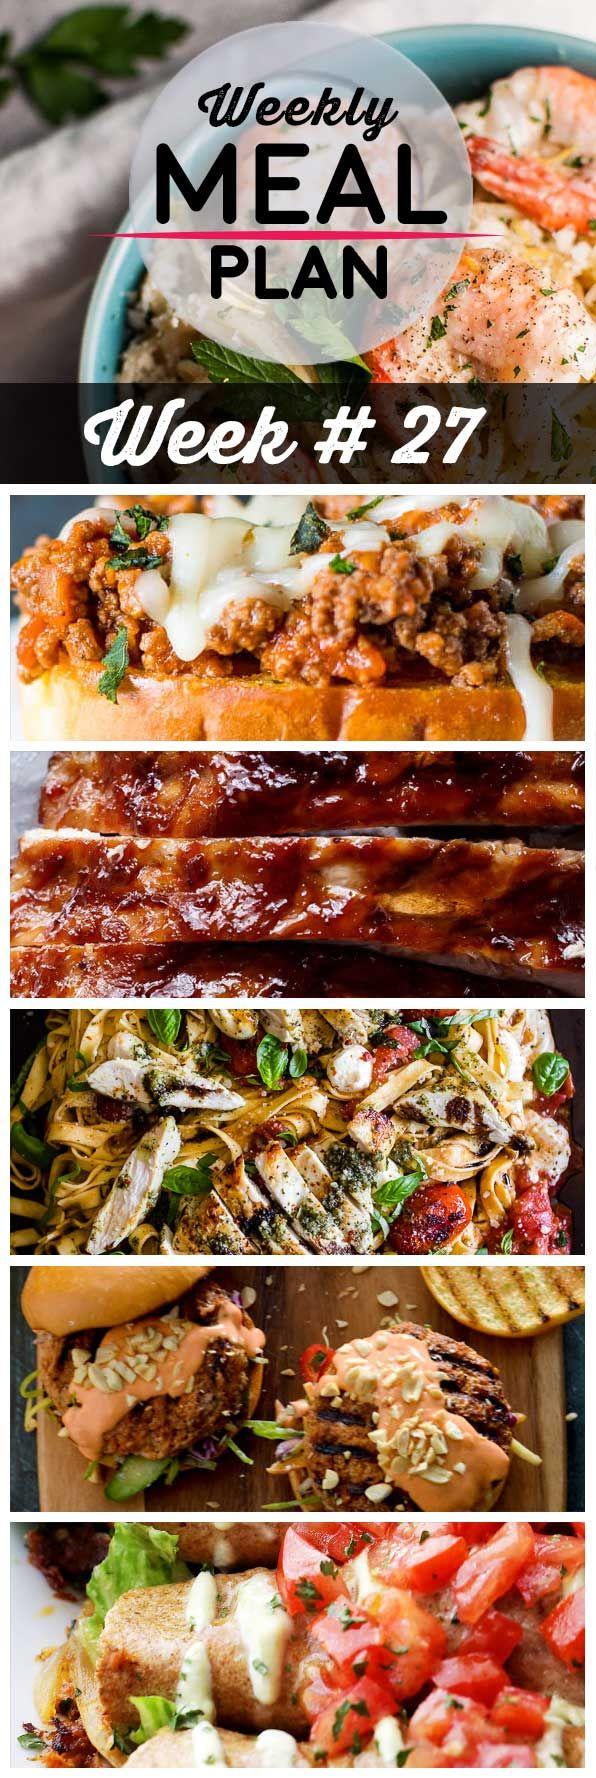 Weekly Meal Plan #27! A meal plan to help you keep things tasty each week, including creamy lemon shrimp spaghetti, Italian sloppy joe sandwiches, slow cooker BBQ ribs, and more!   HomemadeHooplah.com